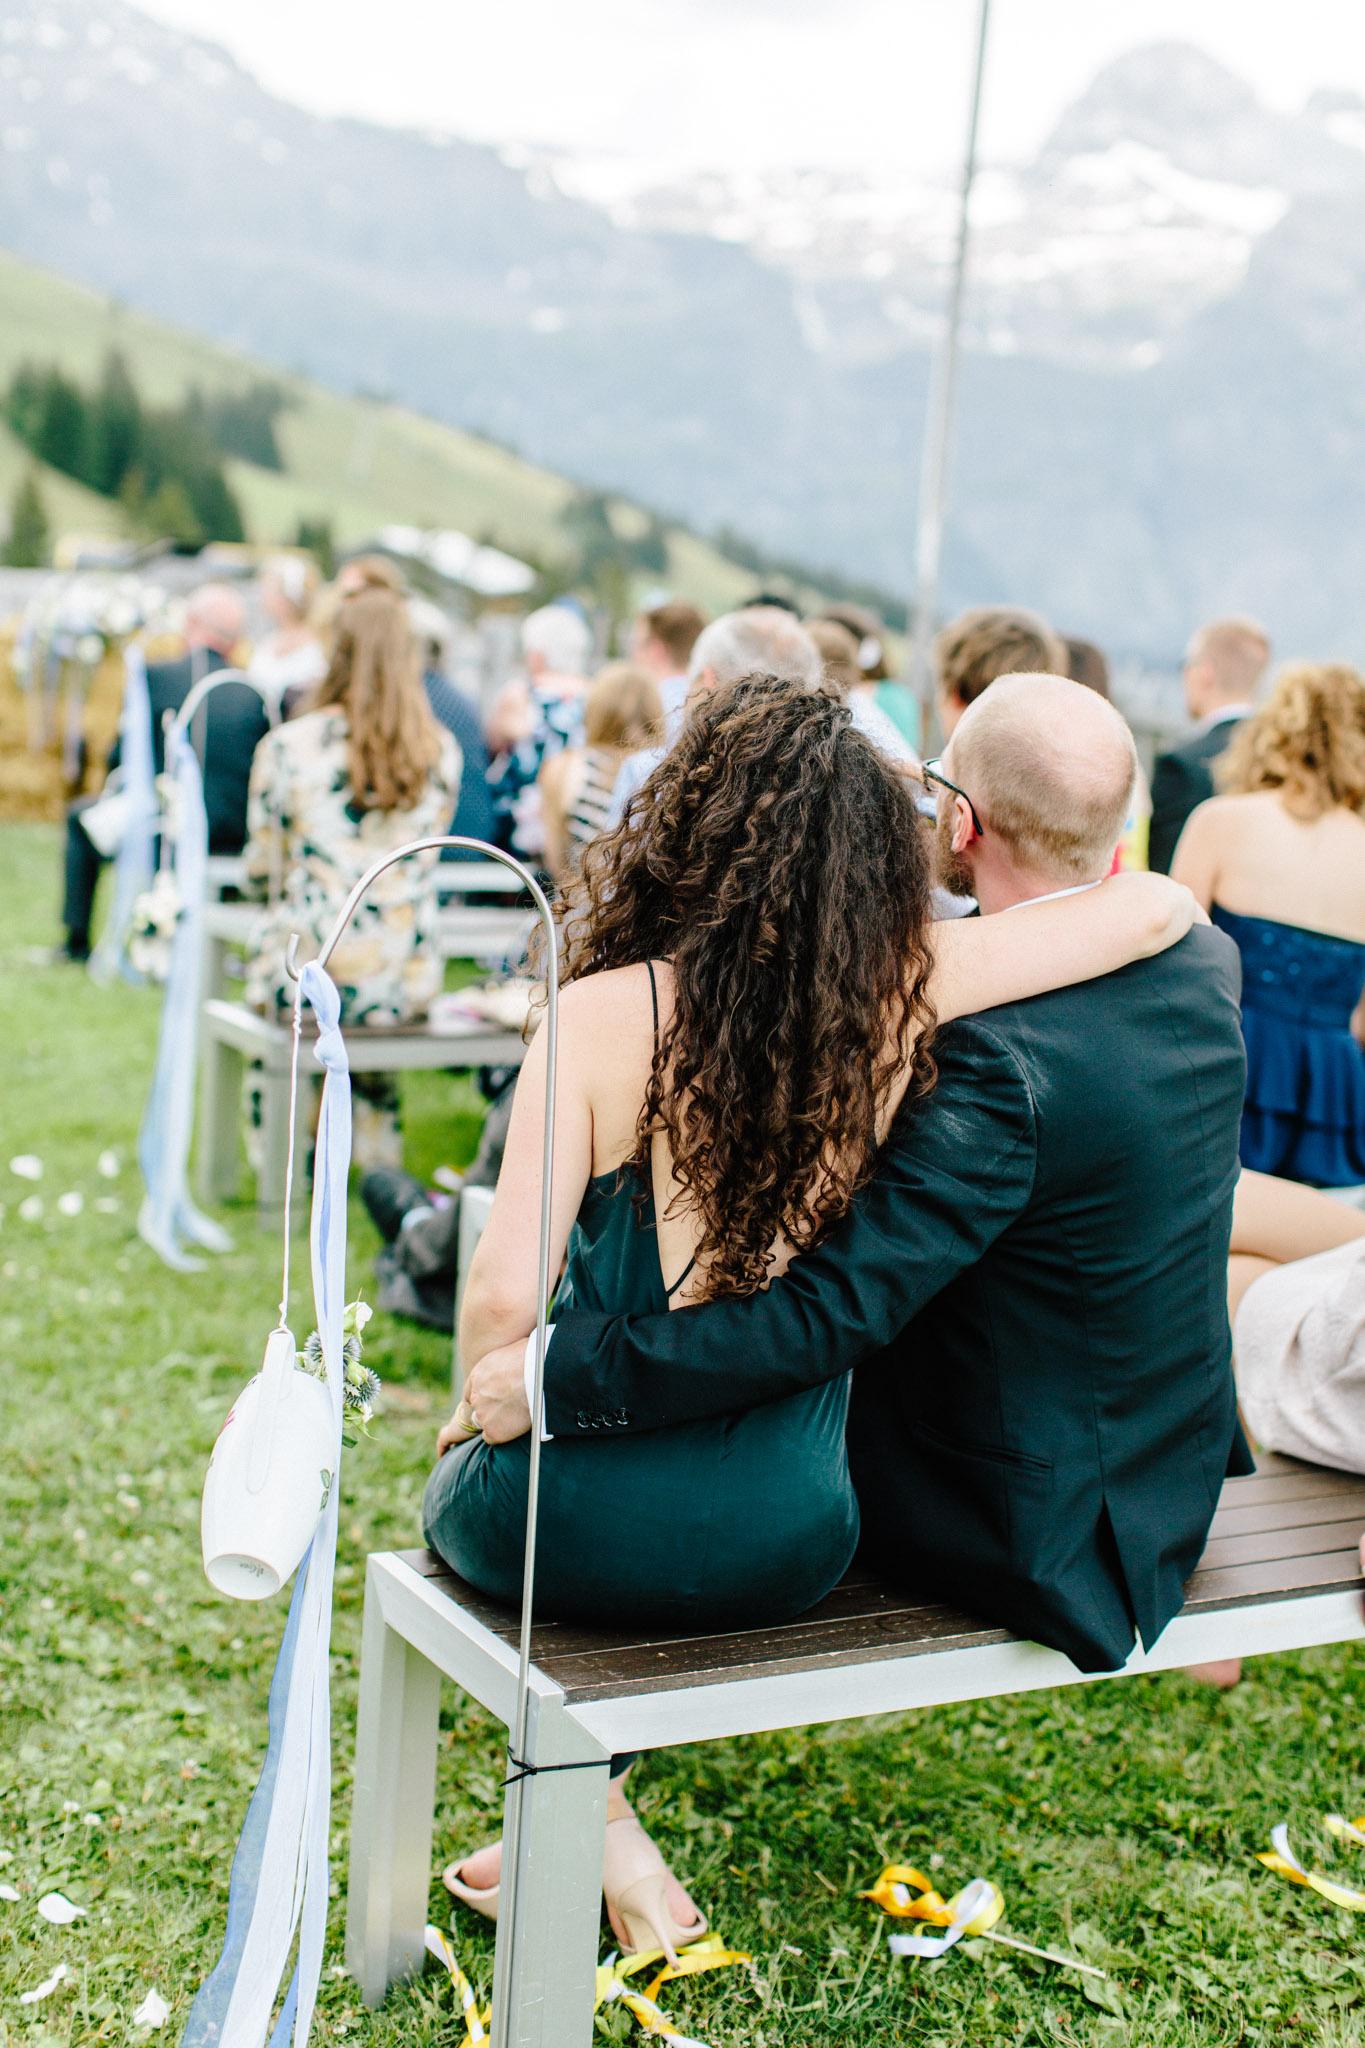 Lenl-Simmental-Buehlerhof-Pia-Anna-Christian-Wedding-Photography-EK-73.jpg